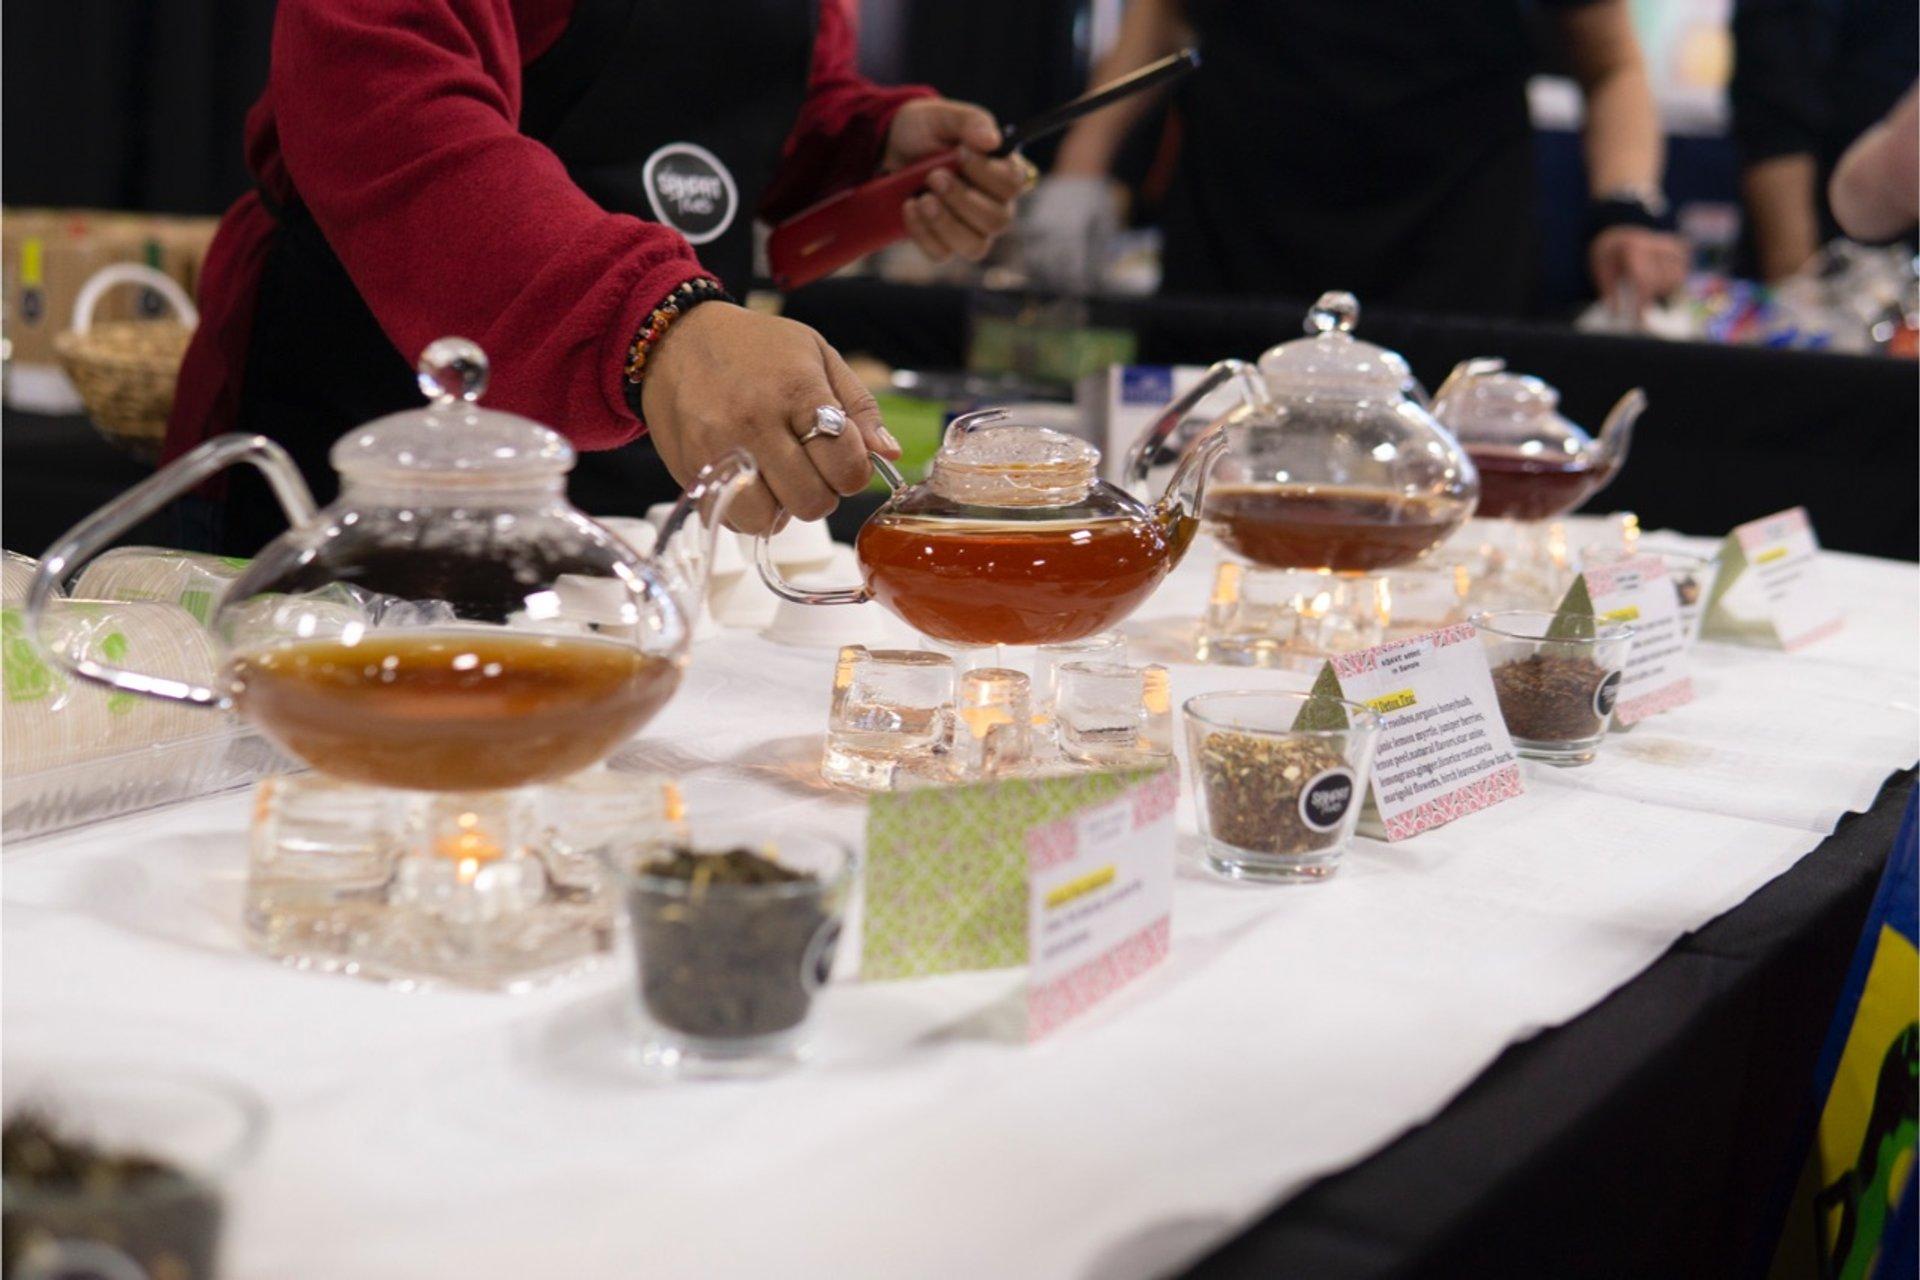 Coffee & Tea Festival 2020 in New York - Dates & Map